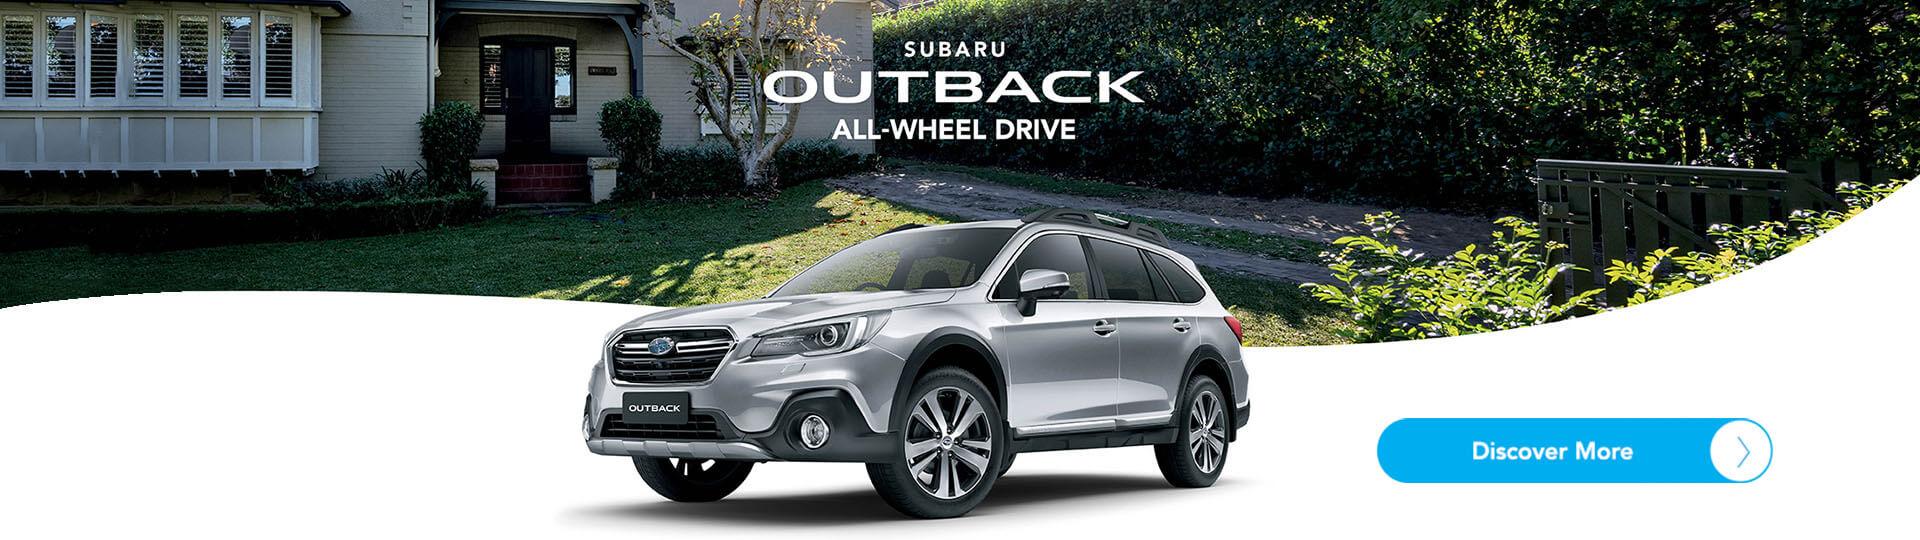 Subaru Outback. All-wheel drive. Discover more!